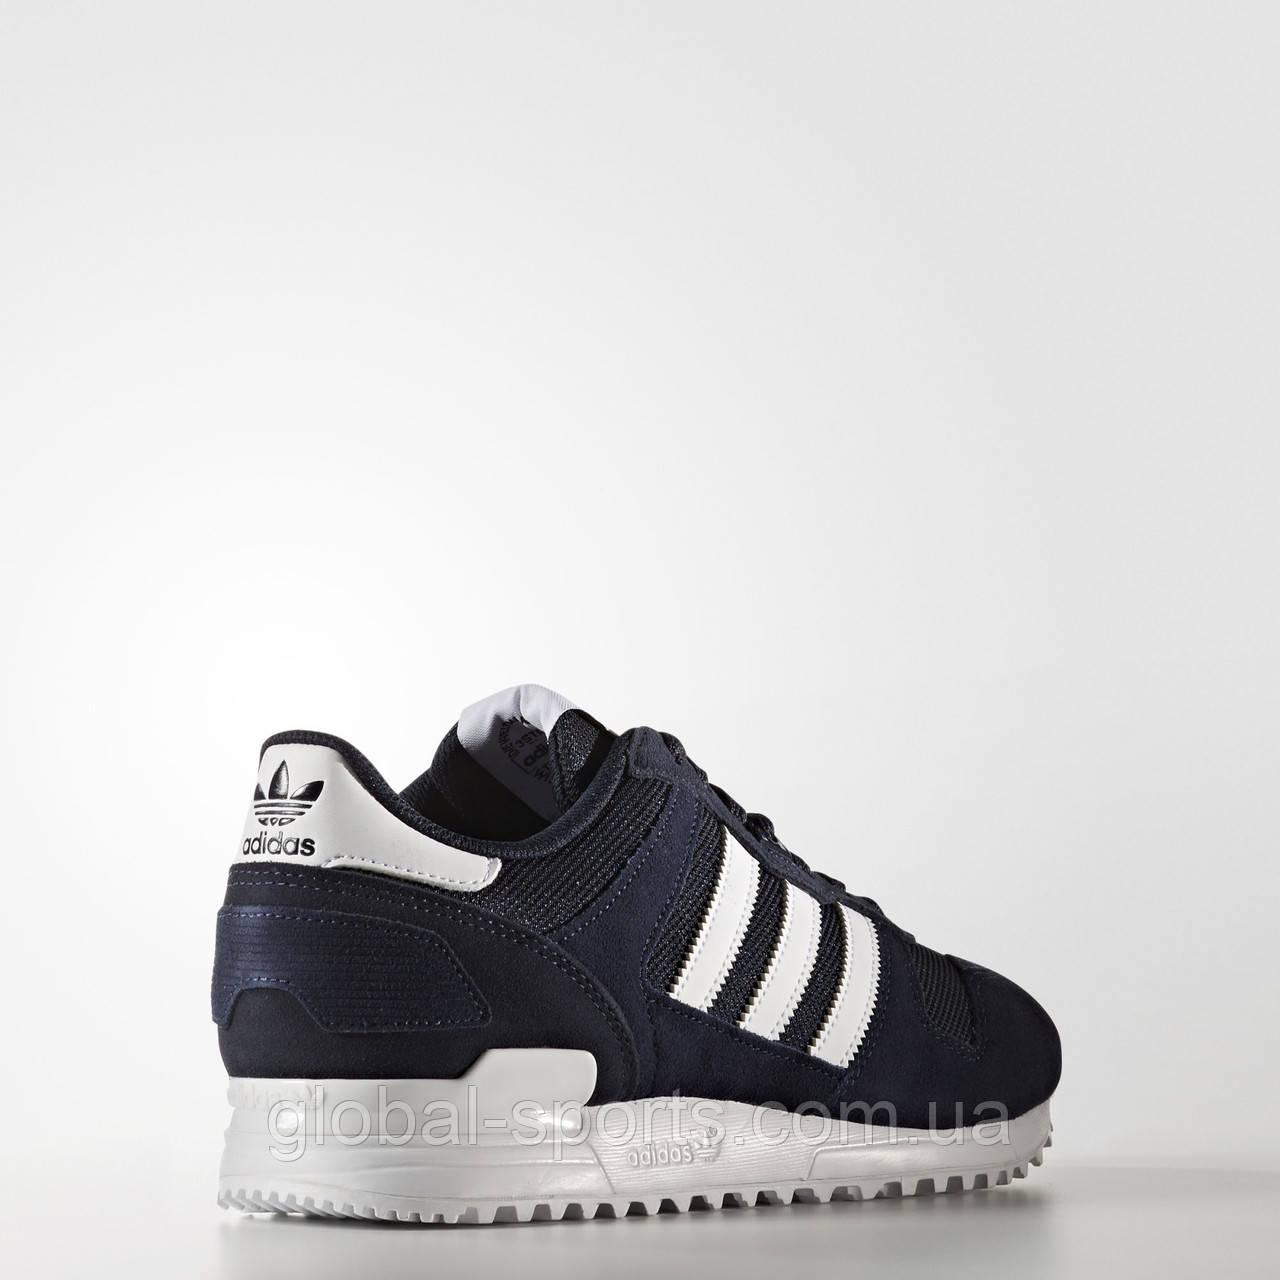 dd053d15 Мужские кроссовки Adidas ZX 700(Артикул:BB1212): продажа, цена в ...